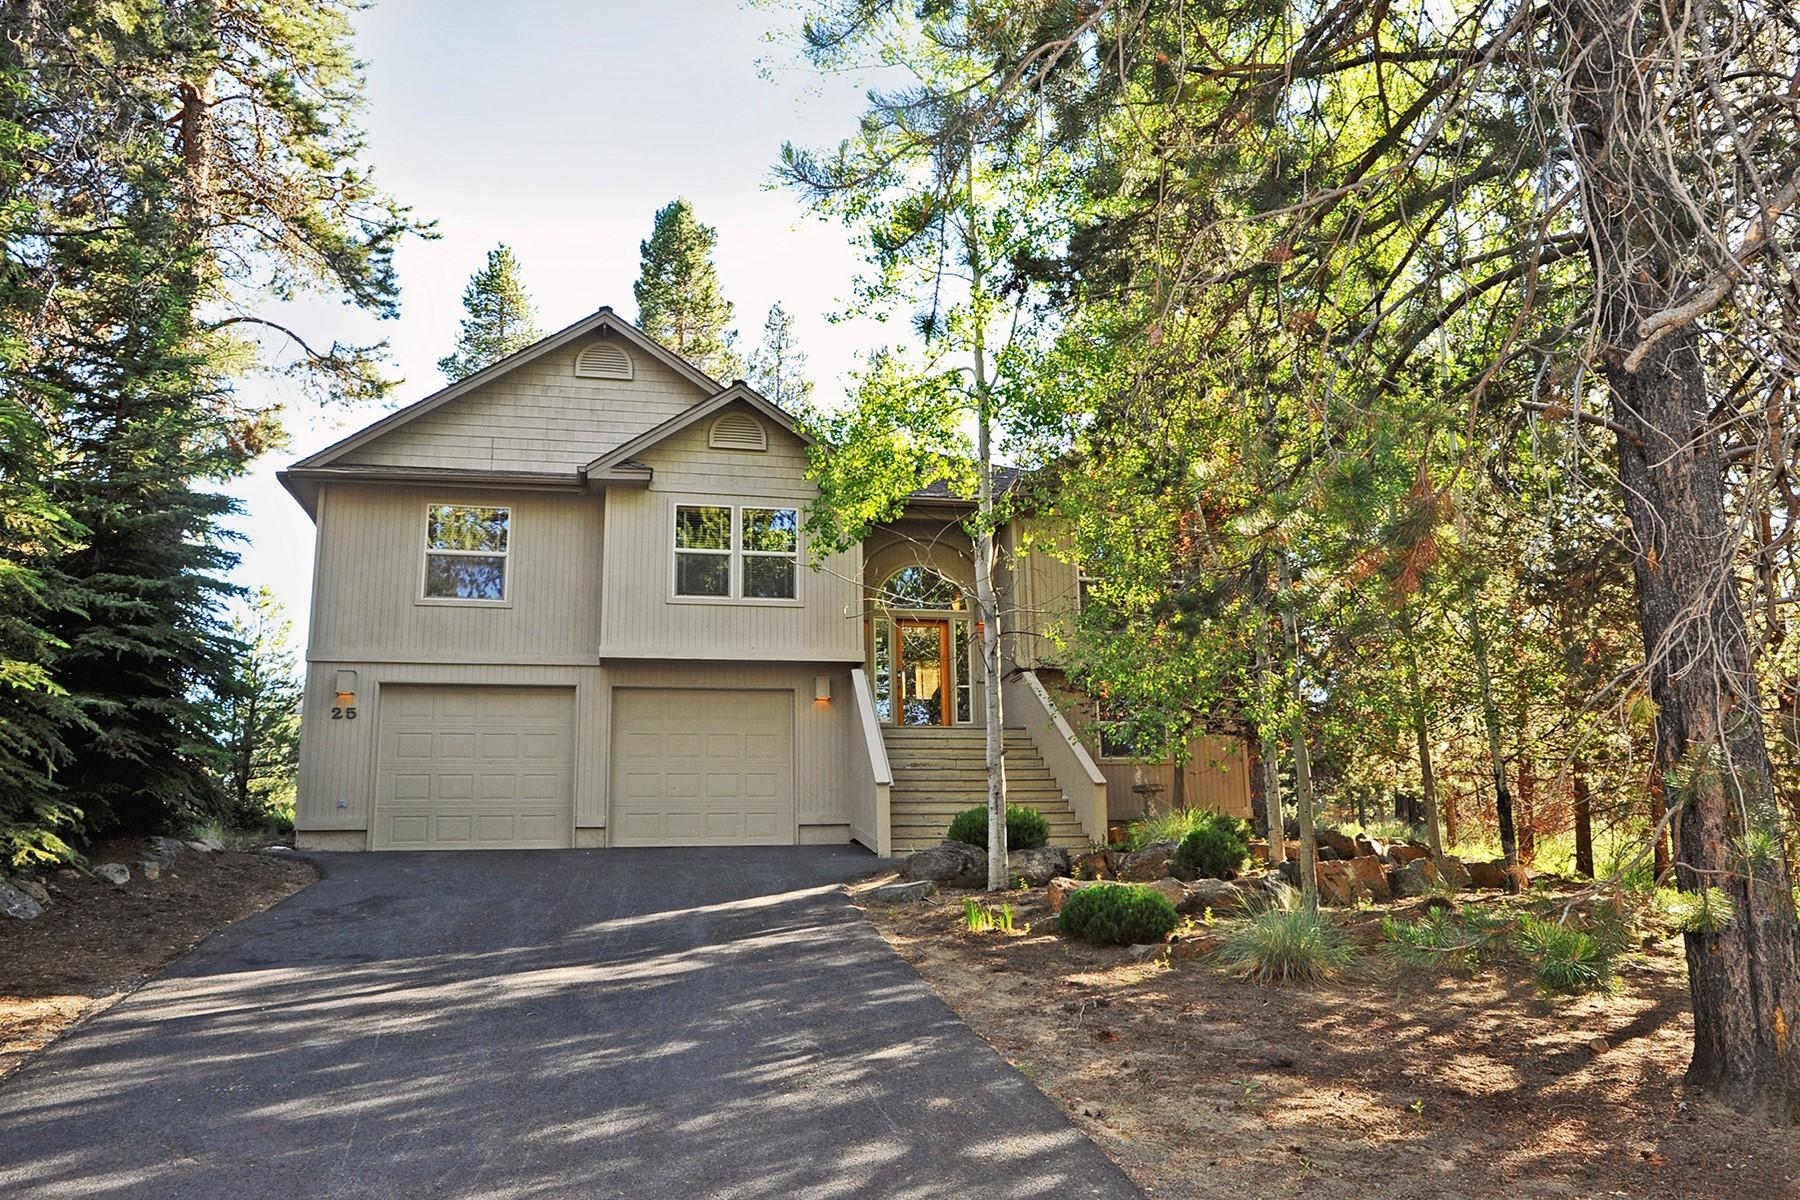 Other Residential Homes για την Πώληση στο 57667 Poplar Loop 25 Sunriver, OR 97707 Sunriver, Ορεγκον 97707 Ηνωμένες Πολιτείες